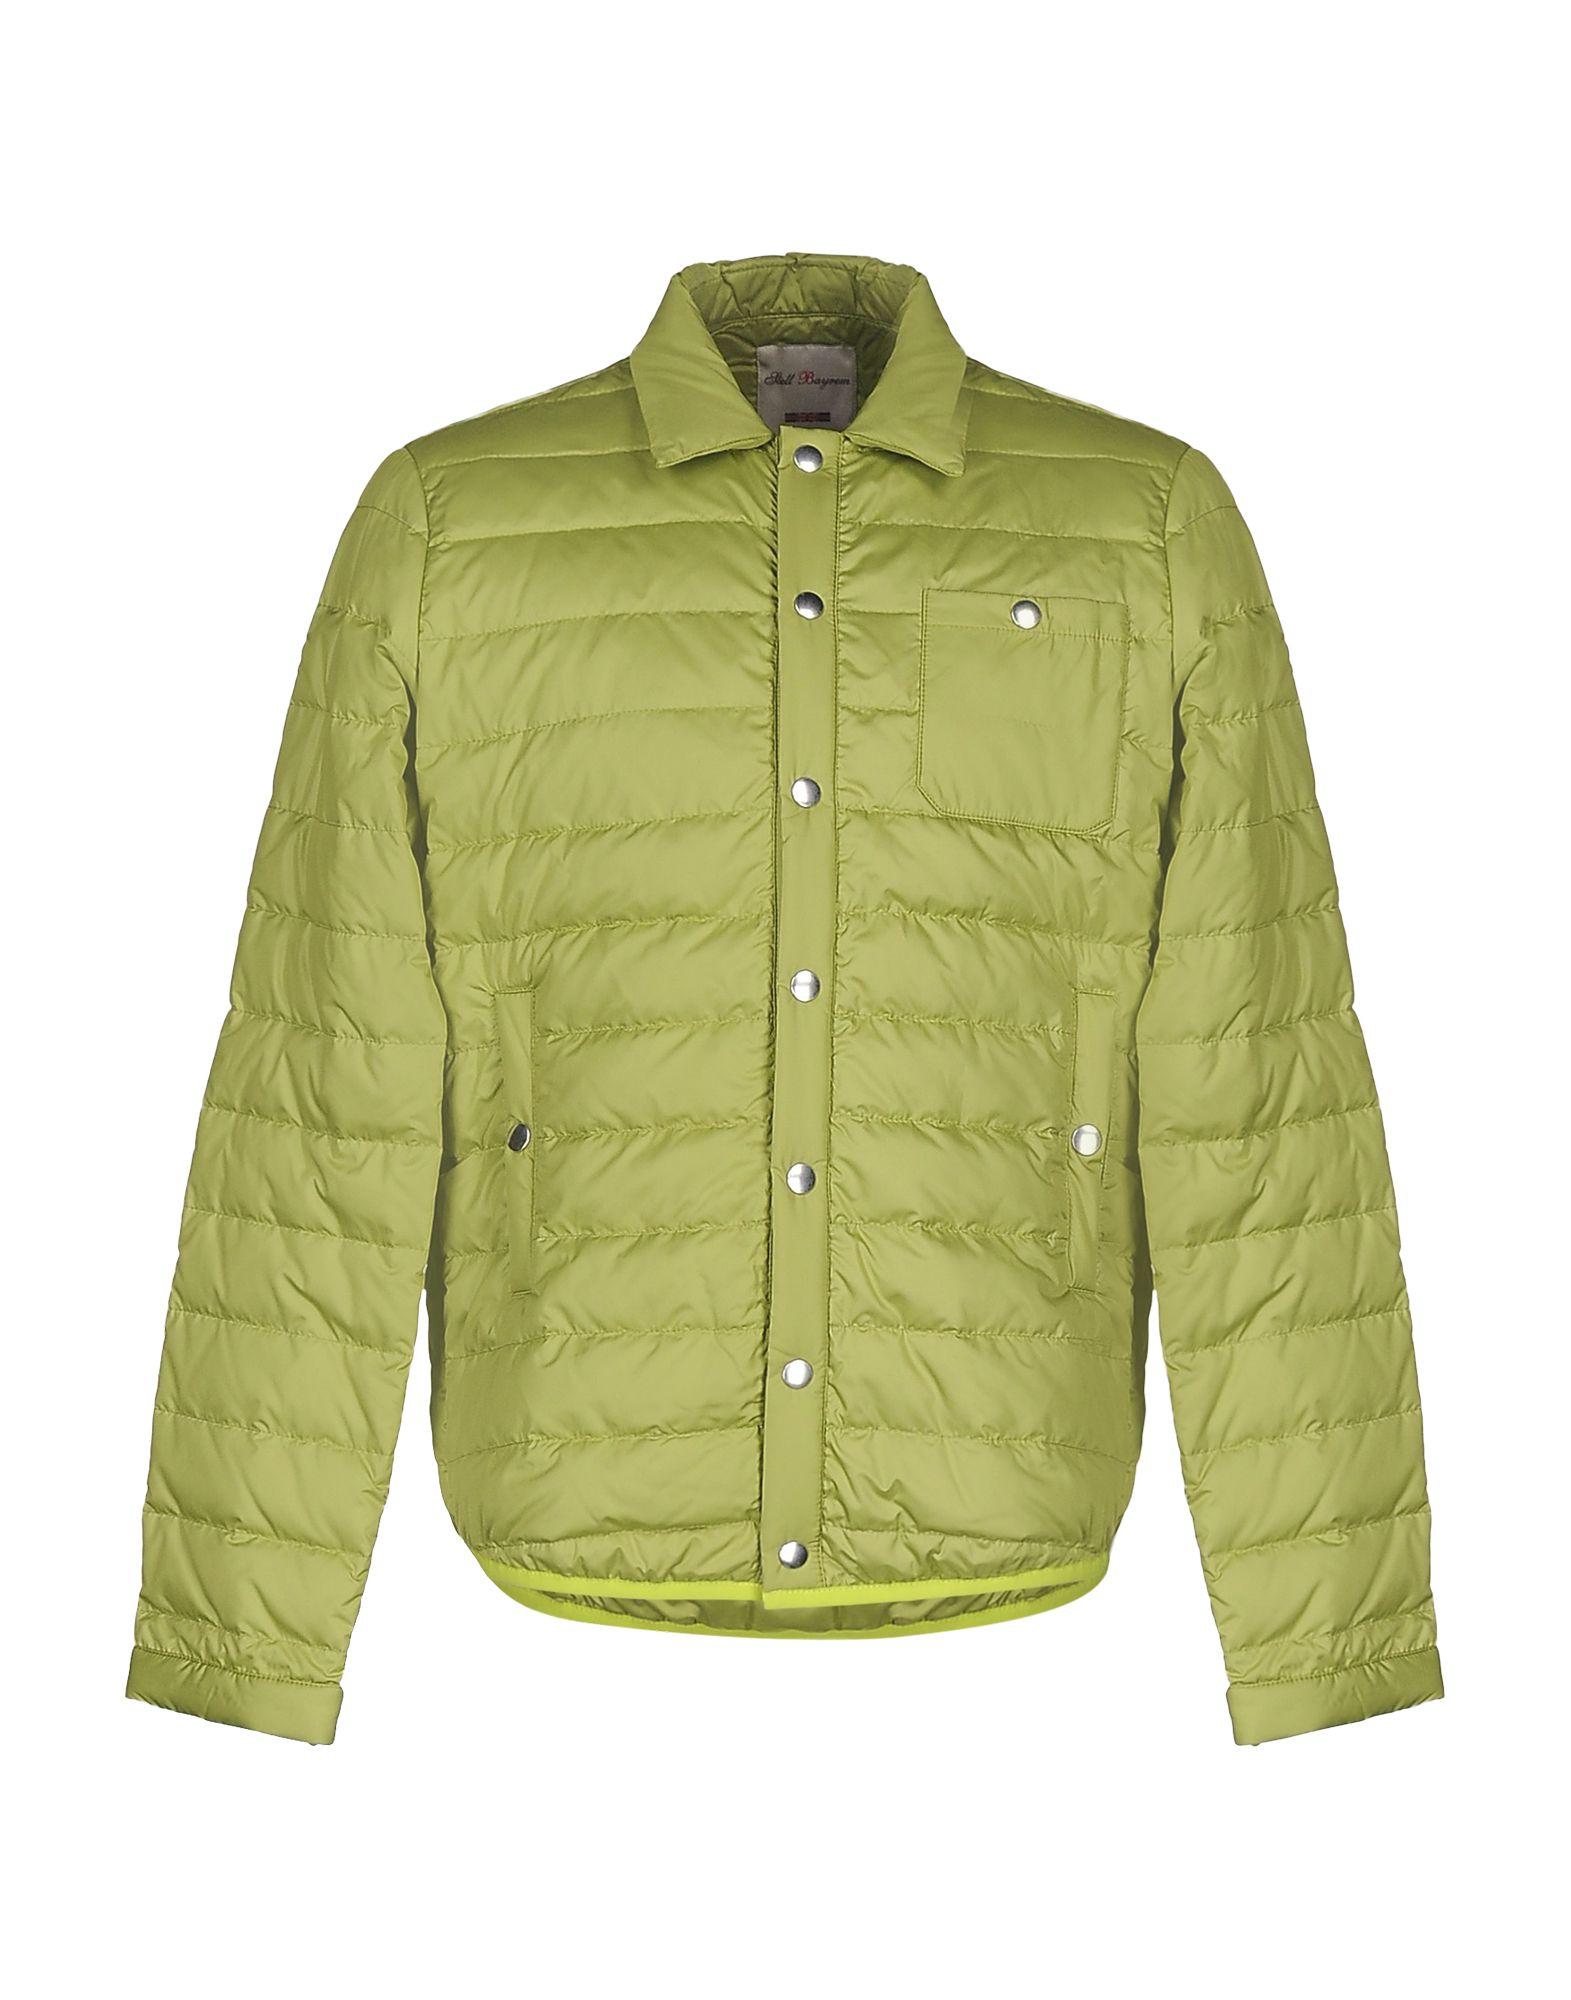 STELL BAYREM Down jackets